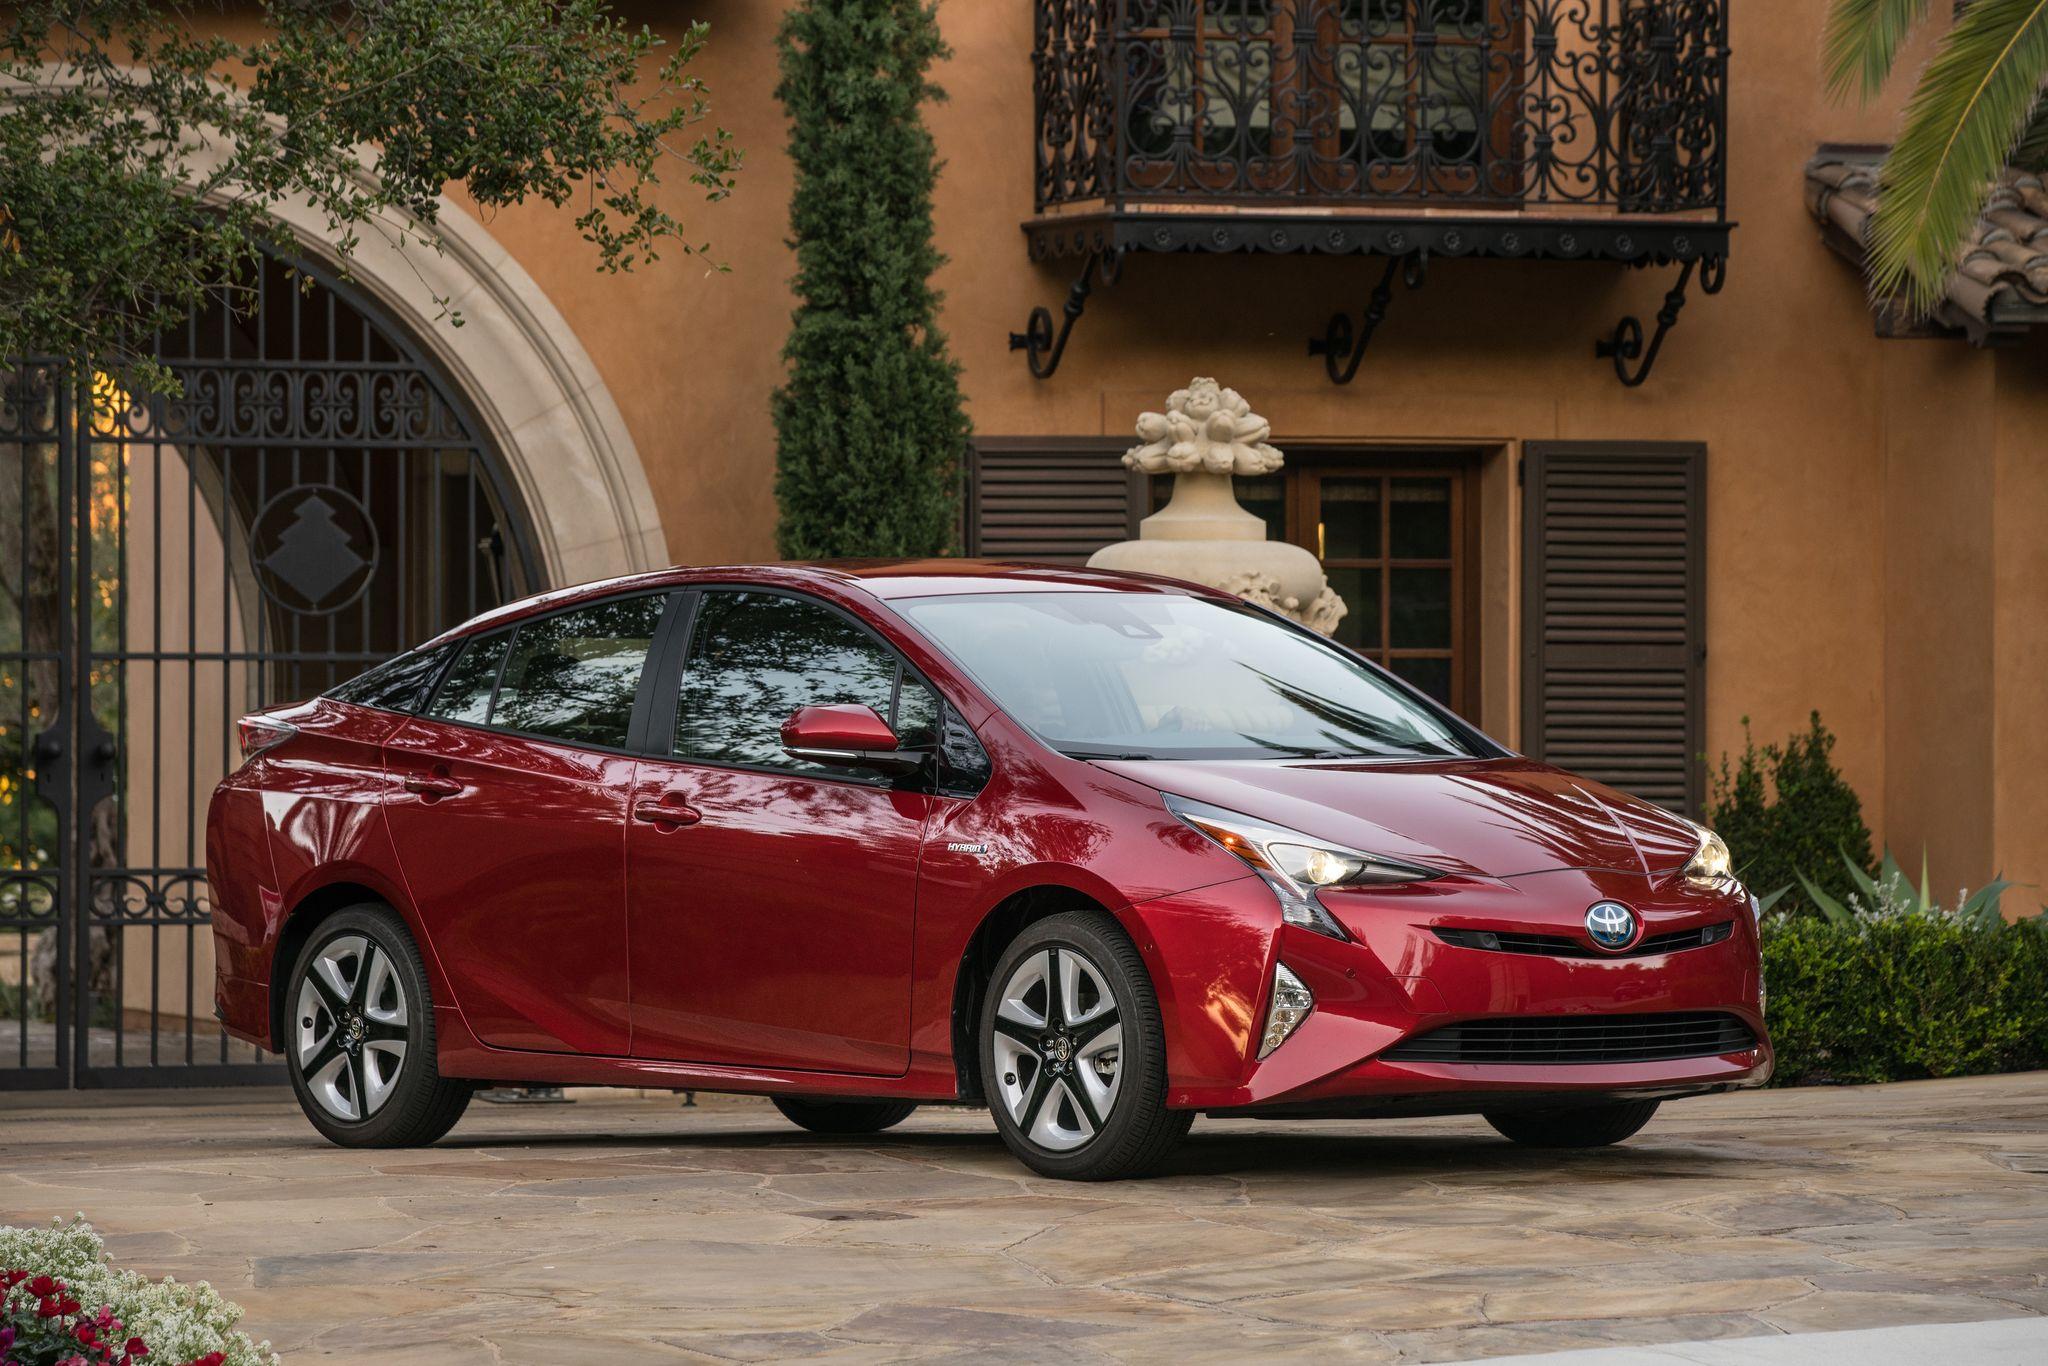 2016 Toyota Prius An Eco Friendly Smart Car